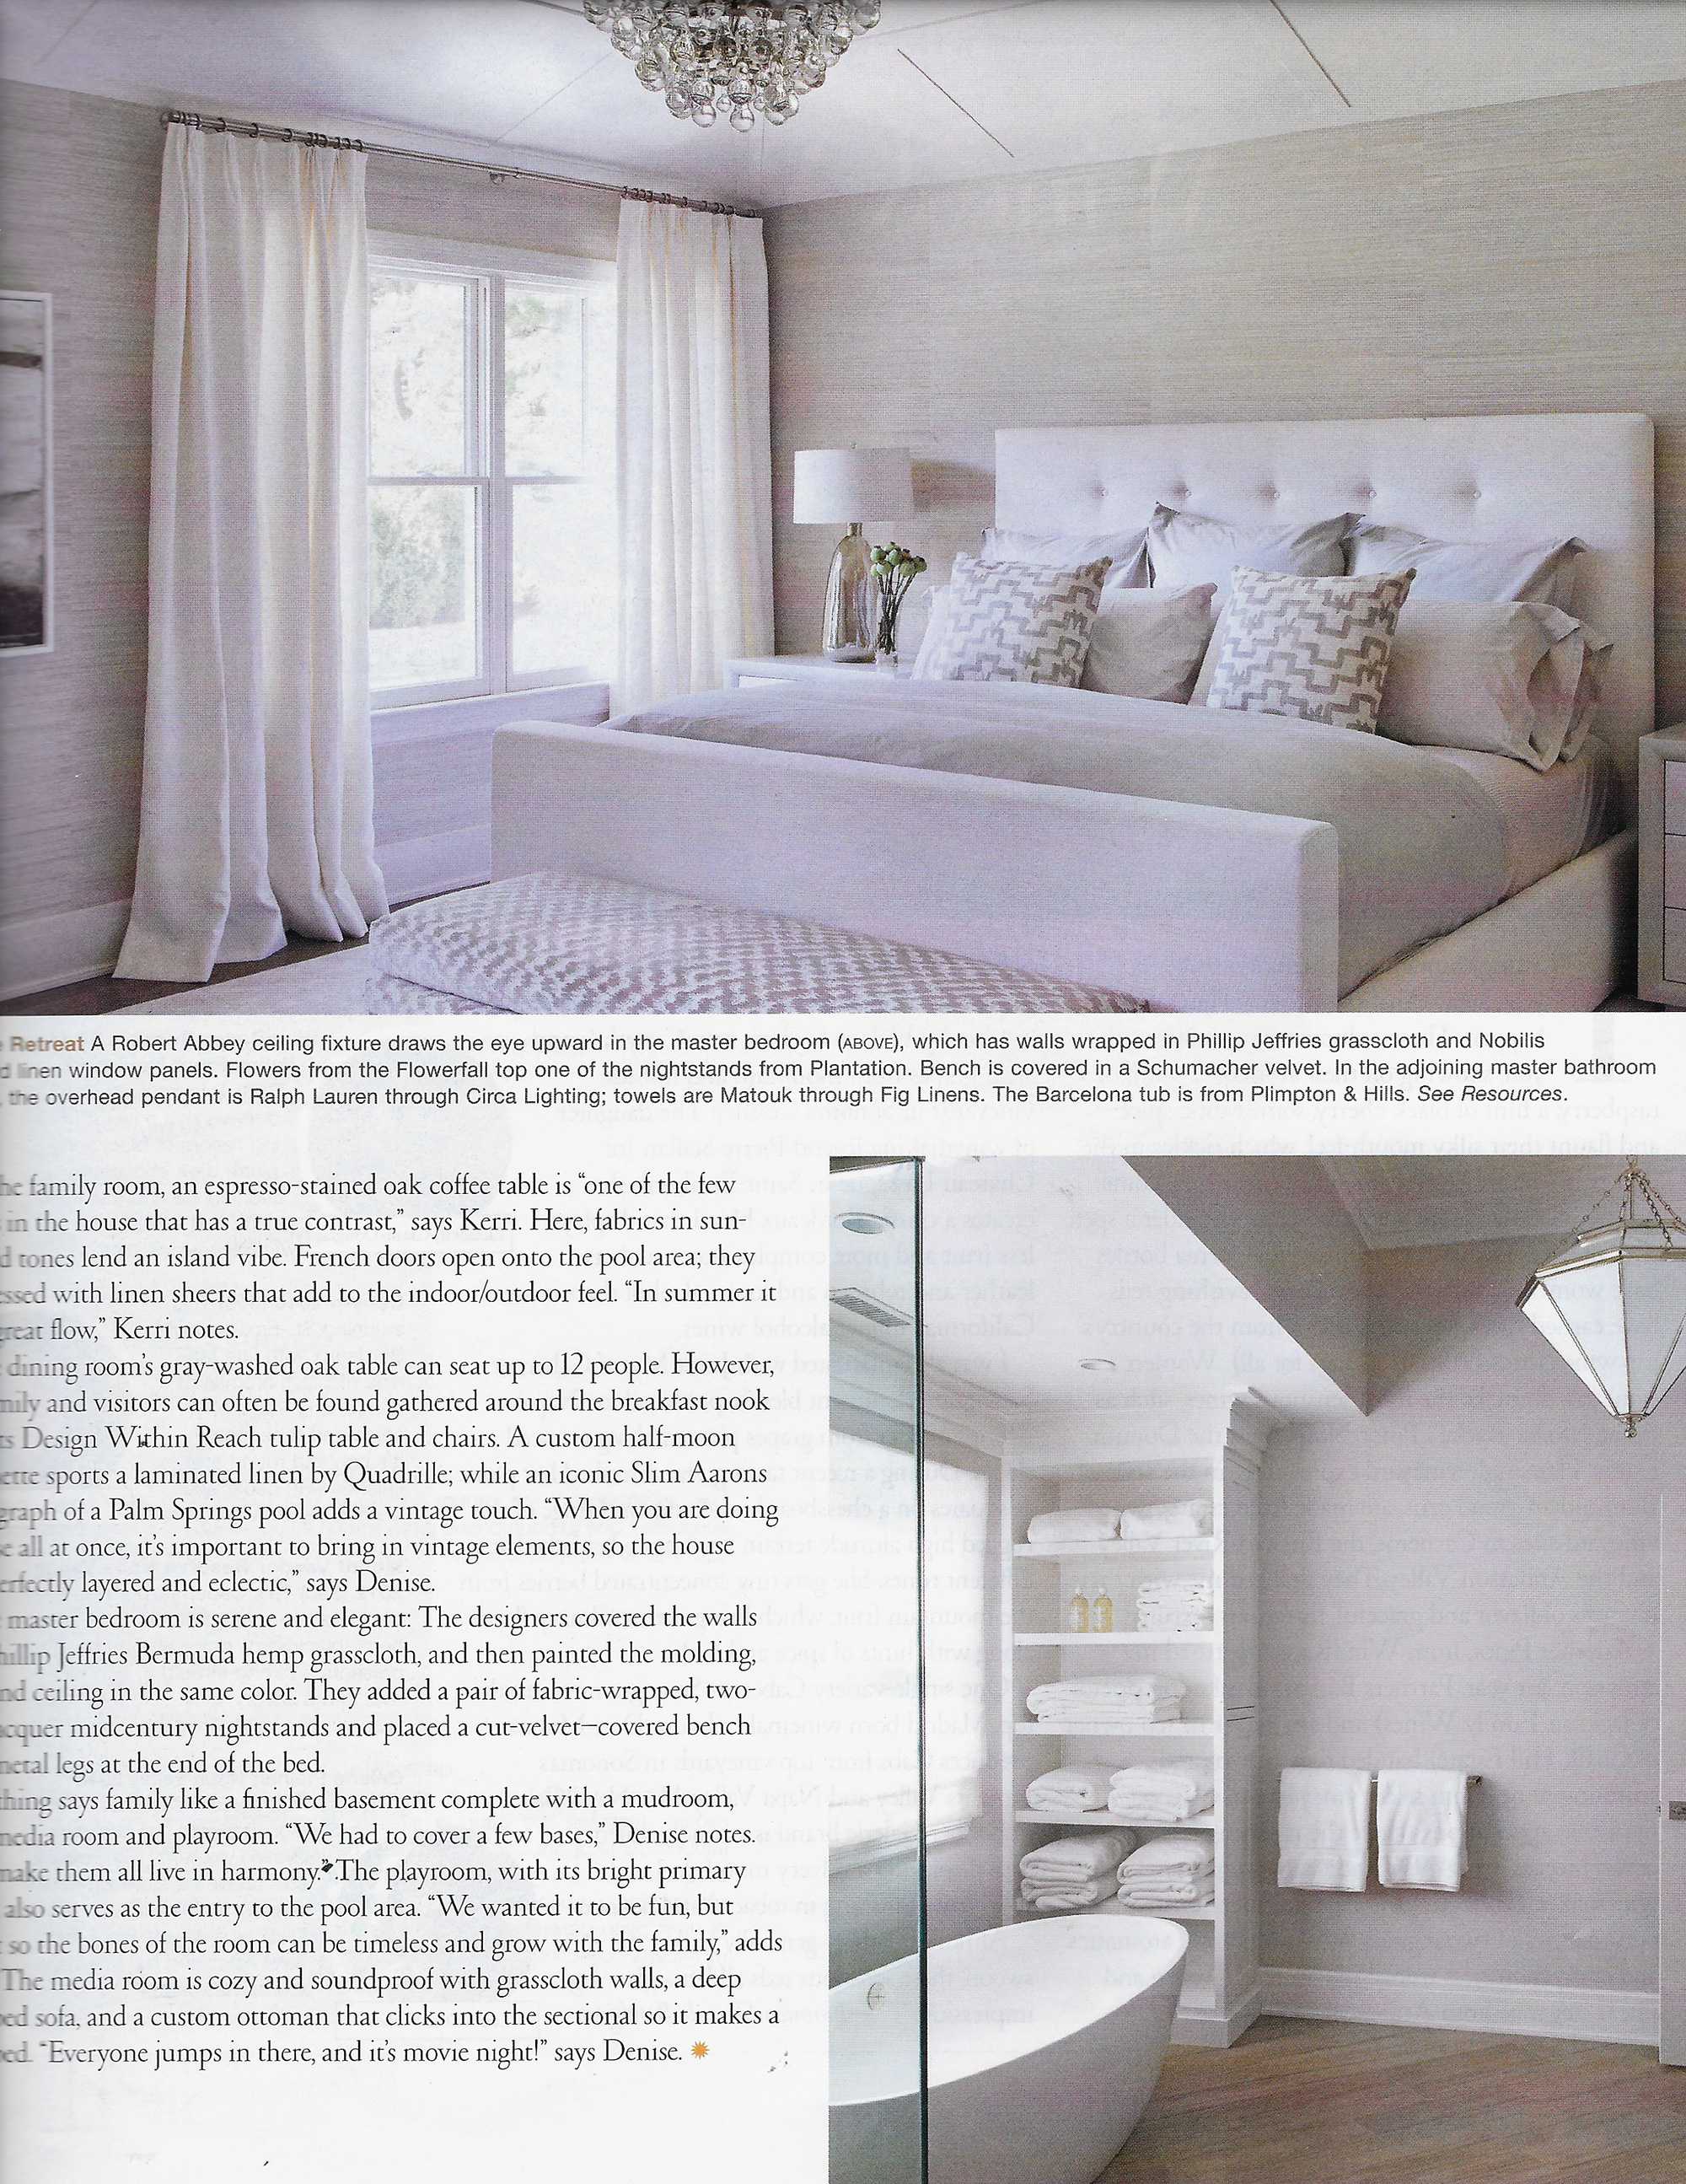 ct-cottages-gardens-good-hands-master-bedroom